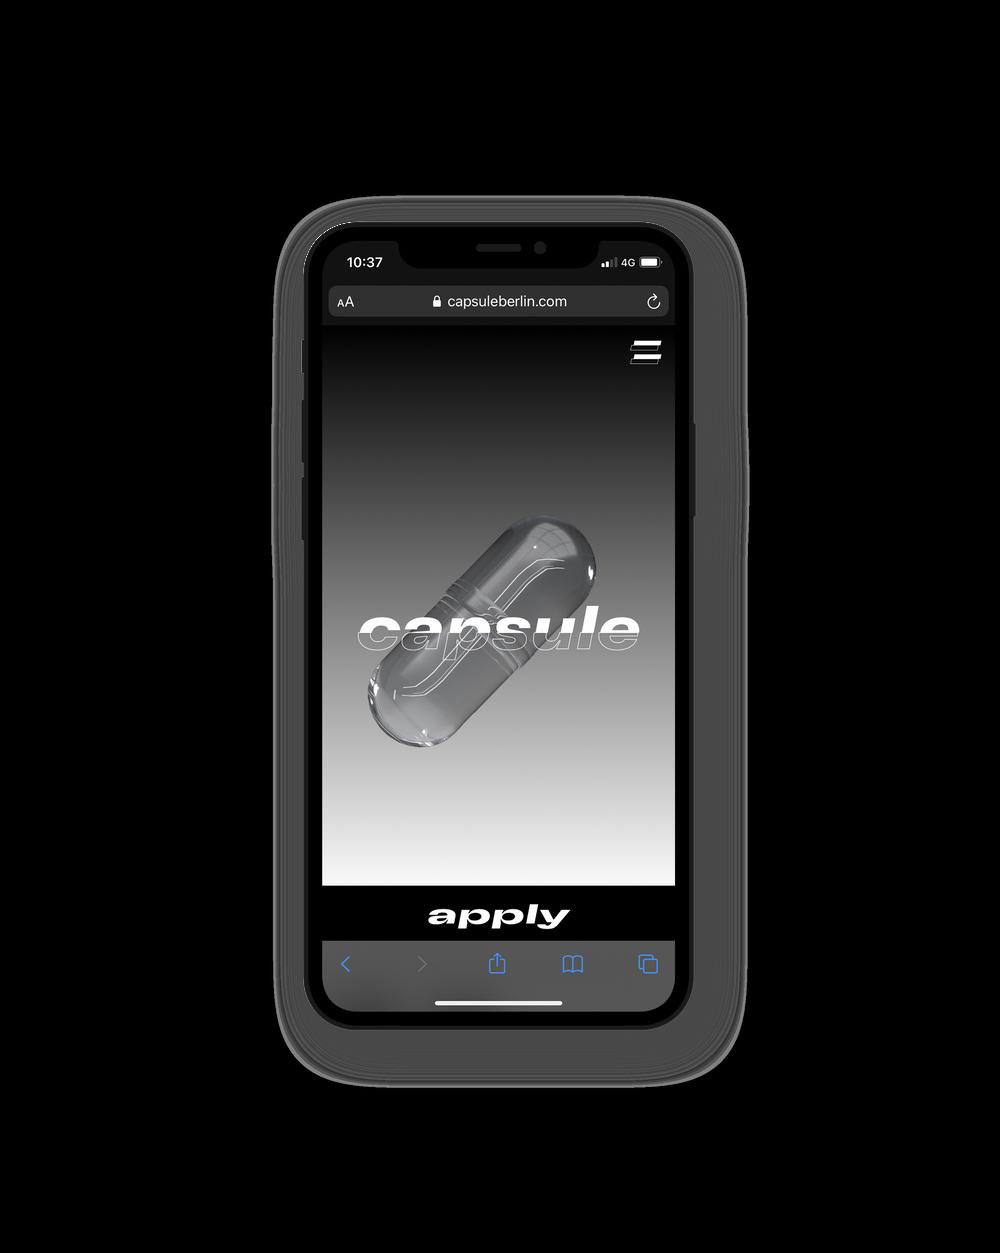 Iphone-Mockup—capsule